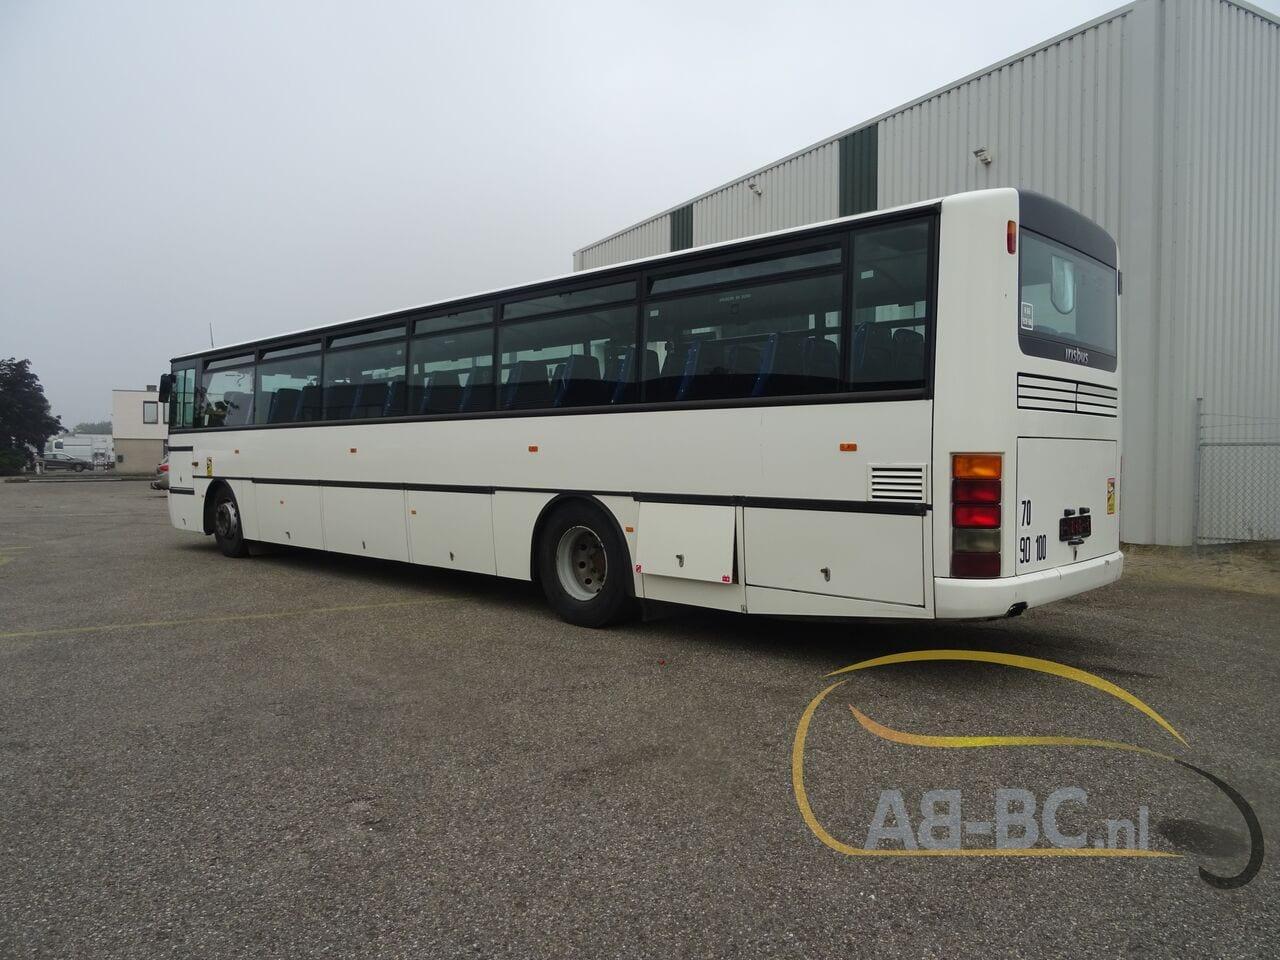 interurban-busIVECO-Irisbus-Recreo-64-Seats---1626159932141913103_big_31999ba0f531bb1bb487a86079f30104--21071309575983154500